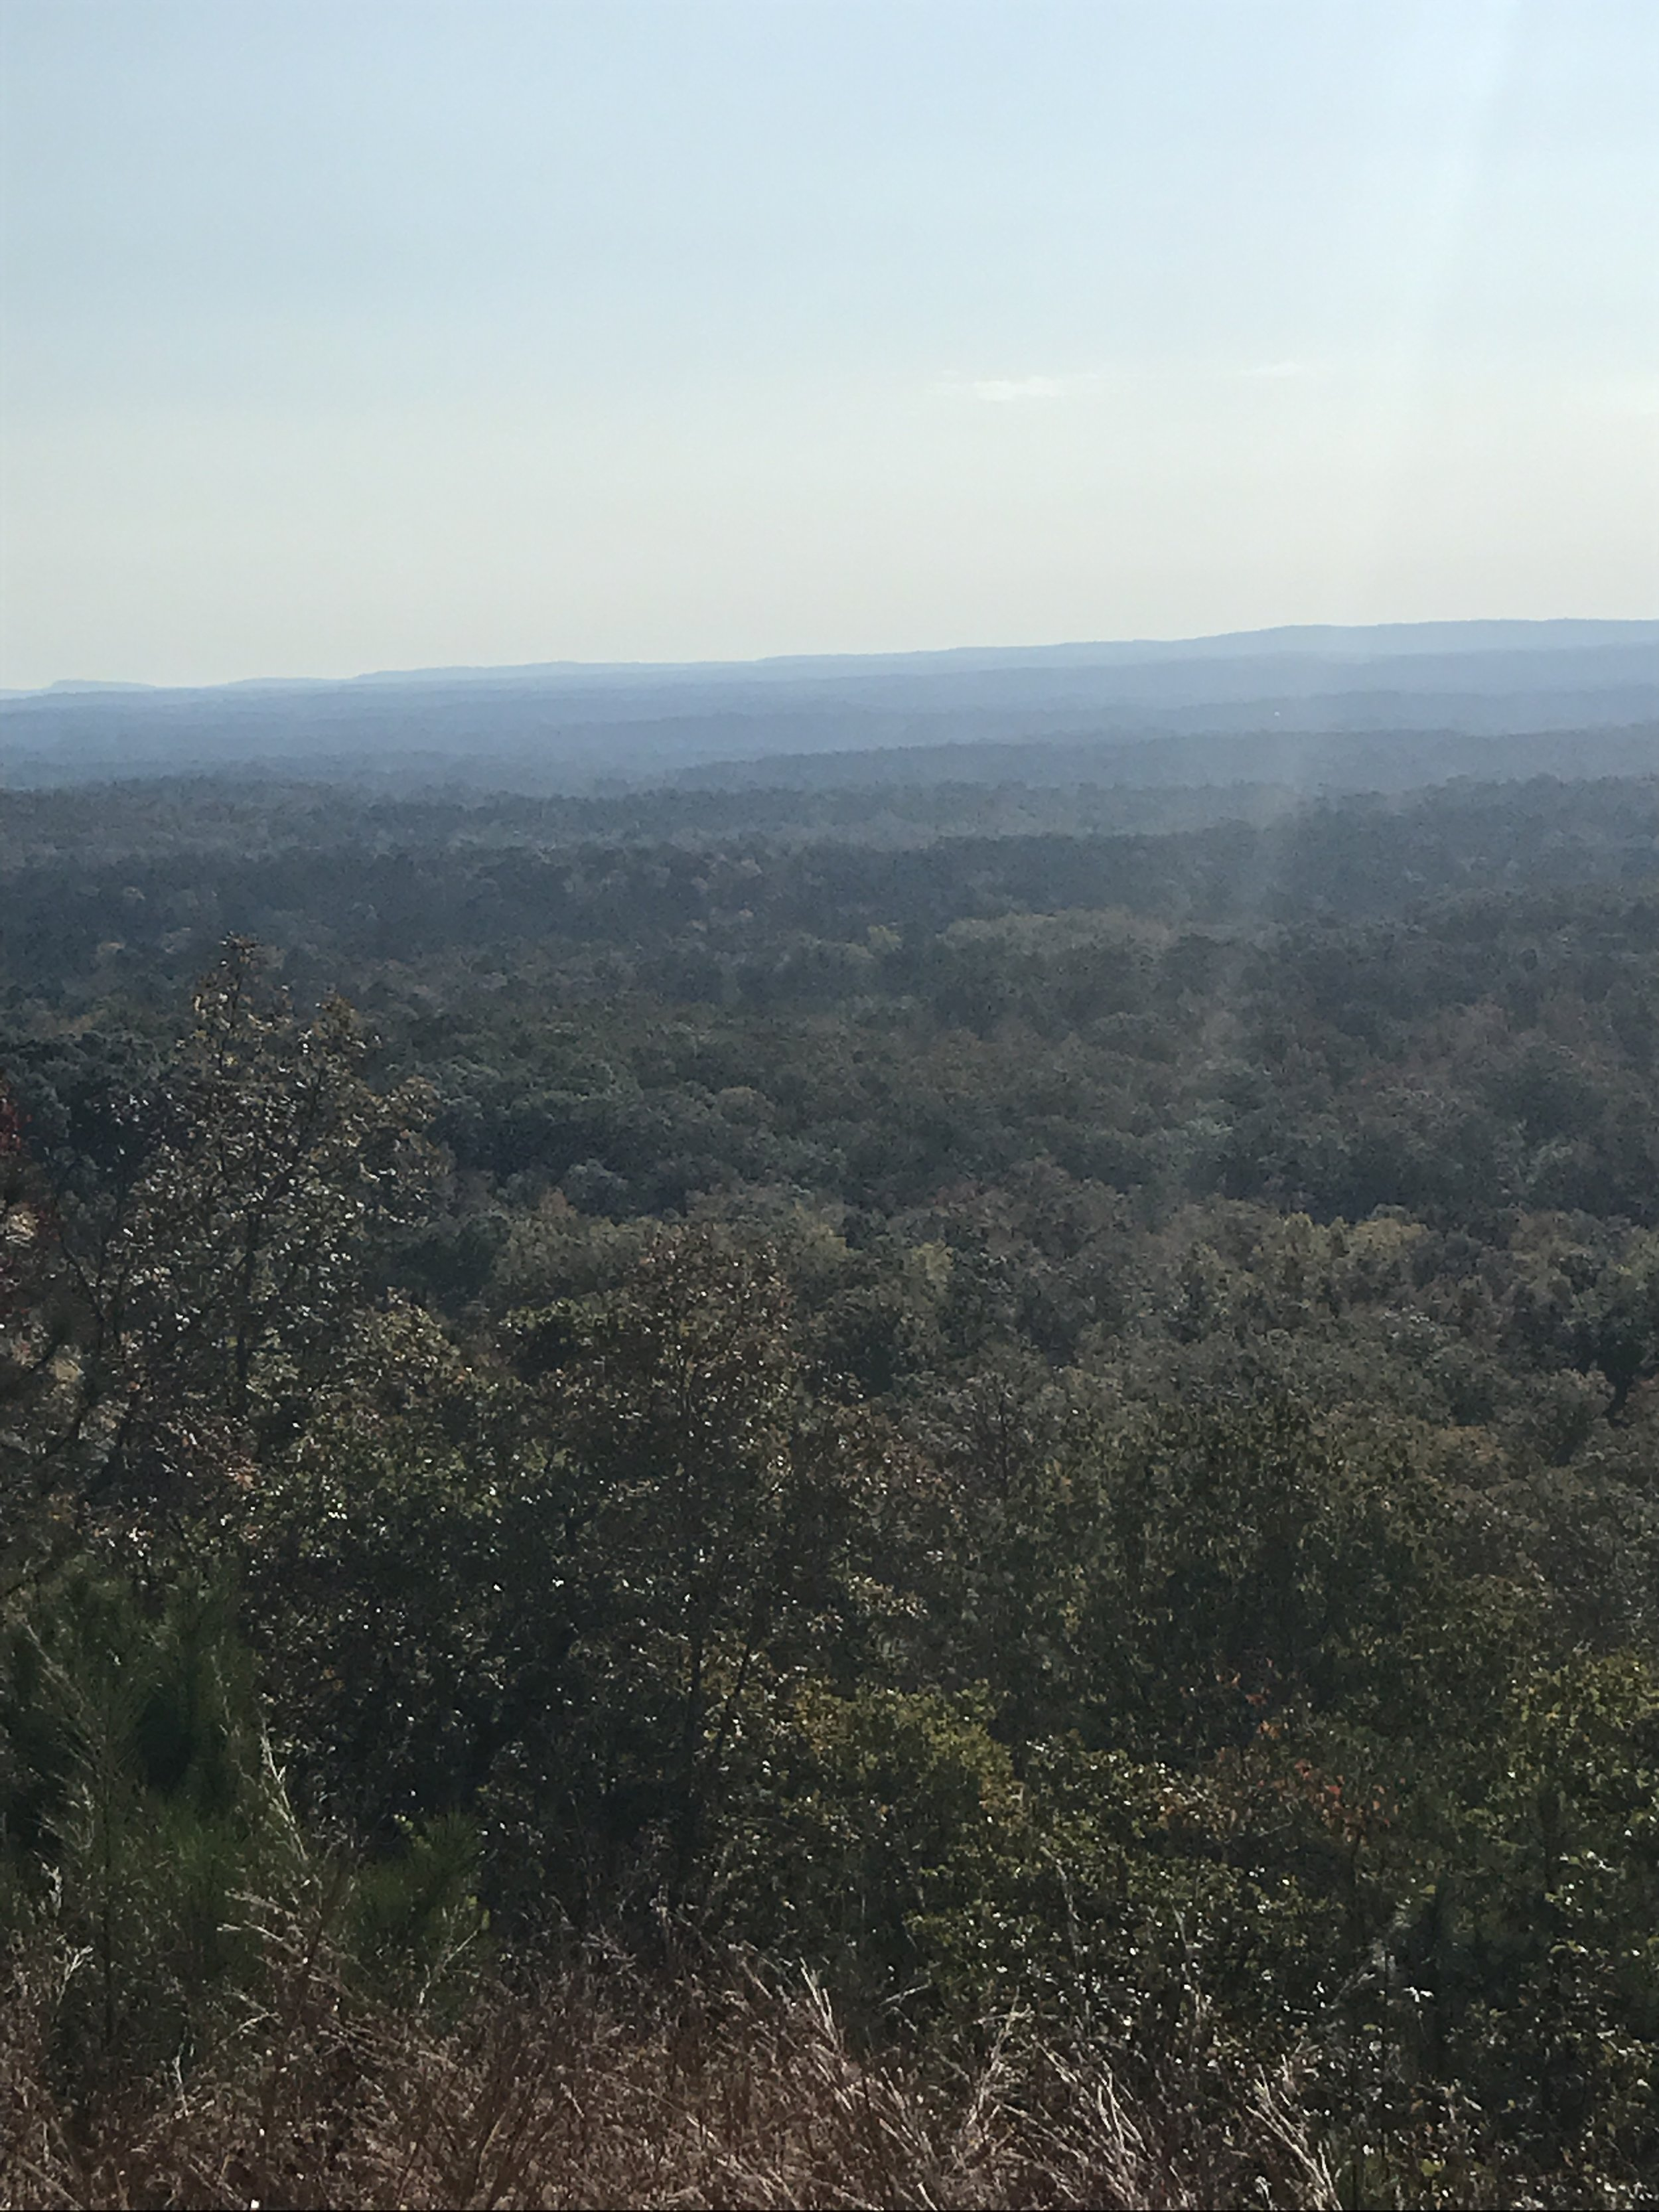 February 24th @ 10:30 - Iron Braid Hike & Lunch